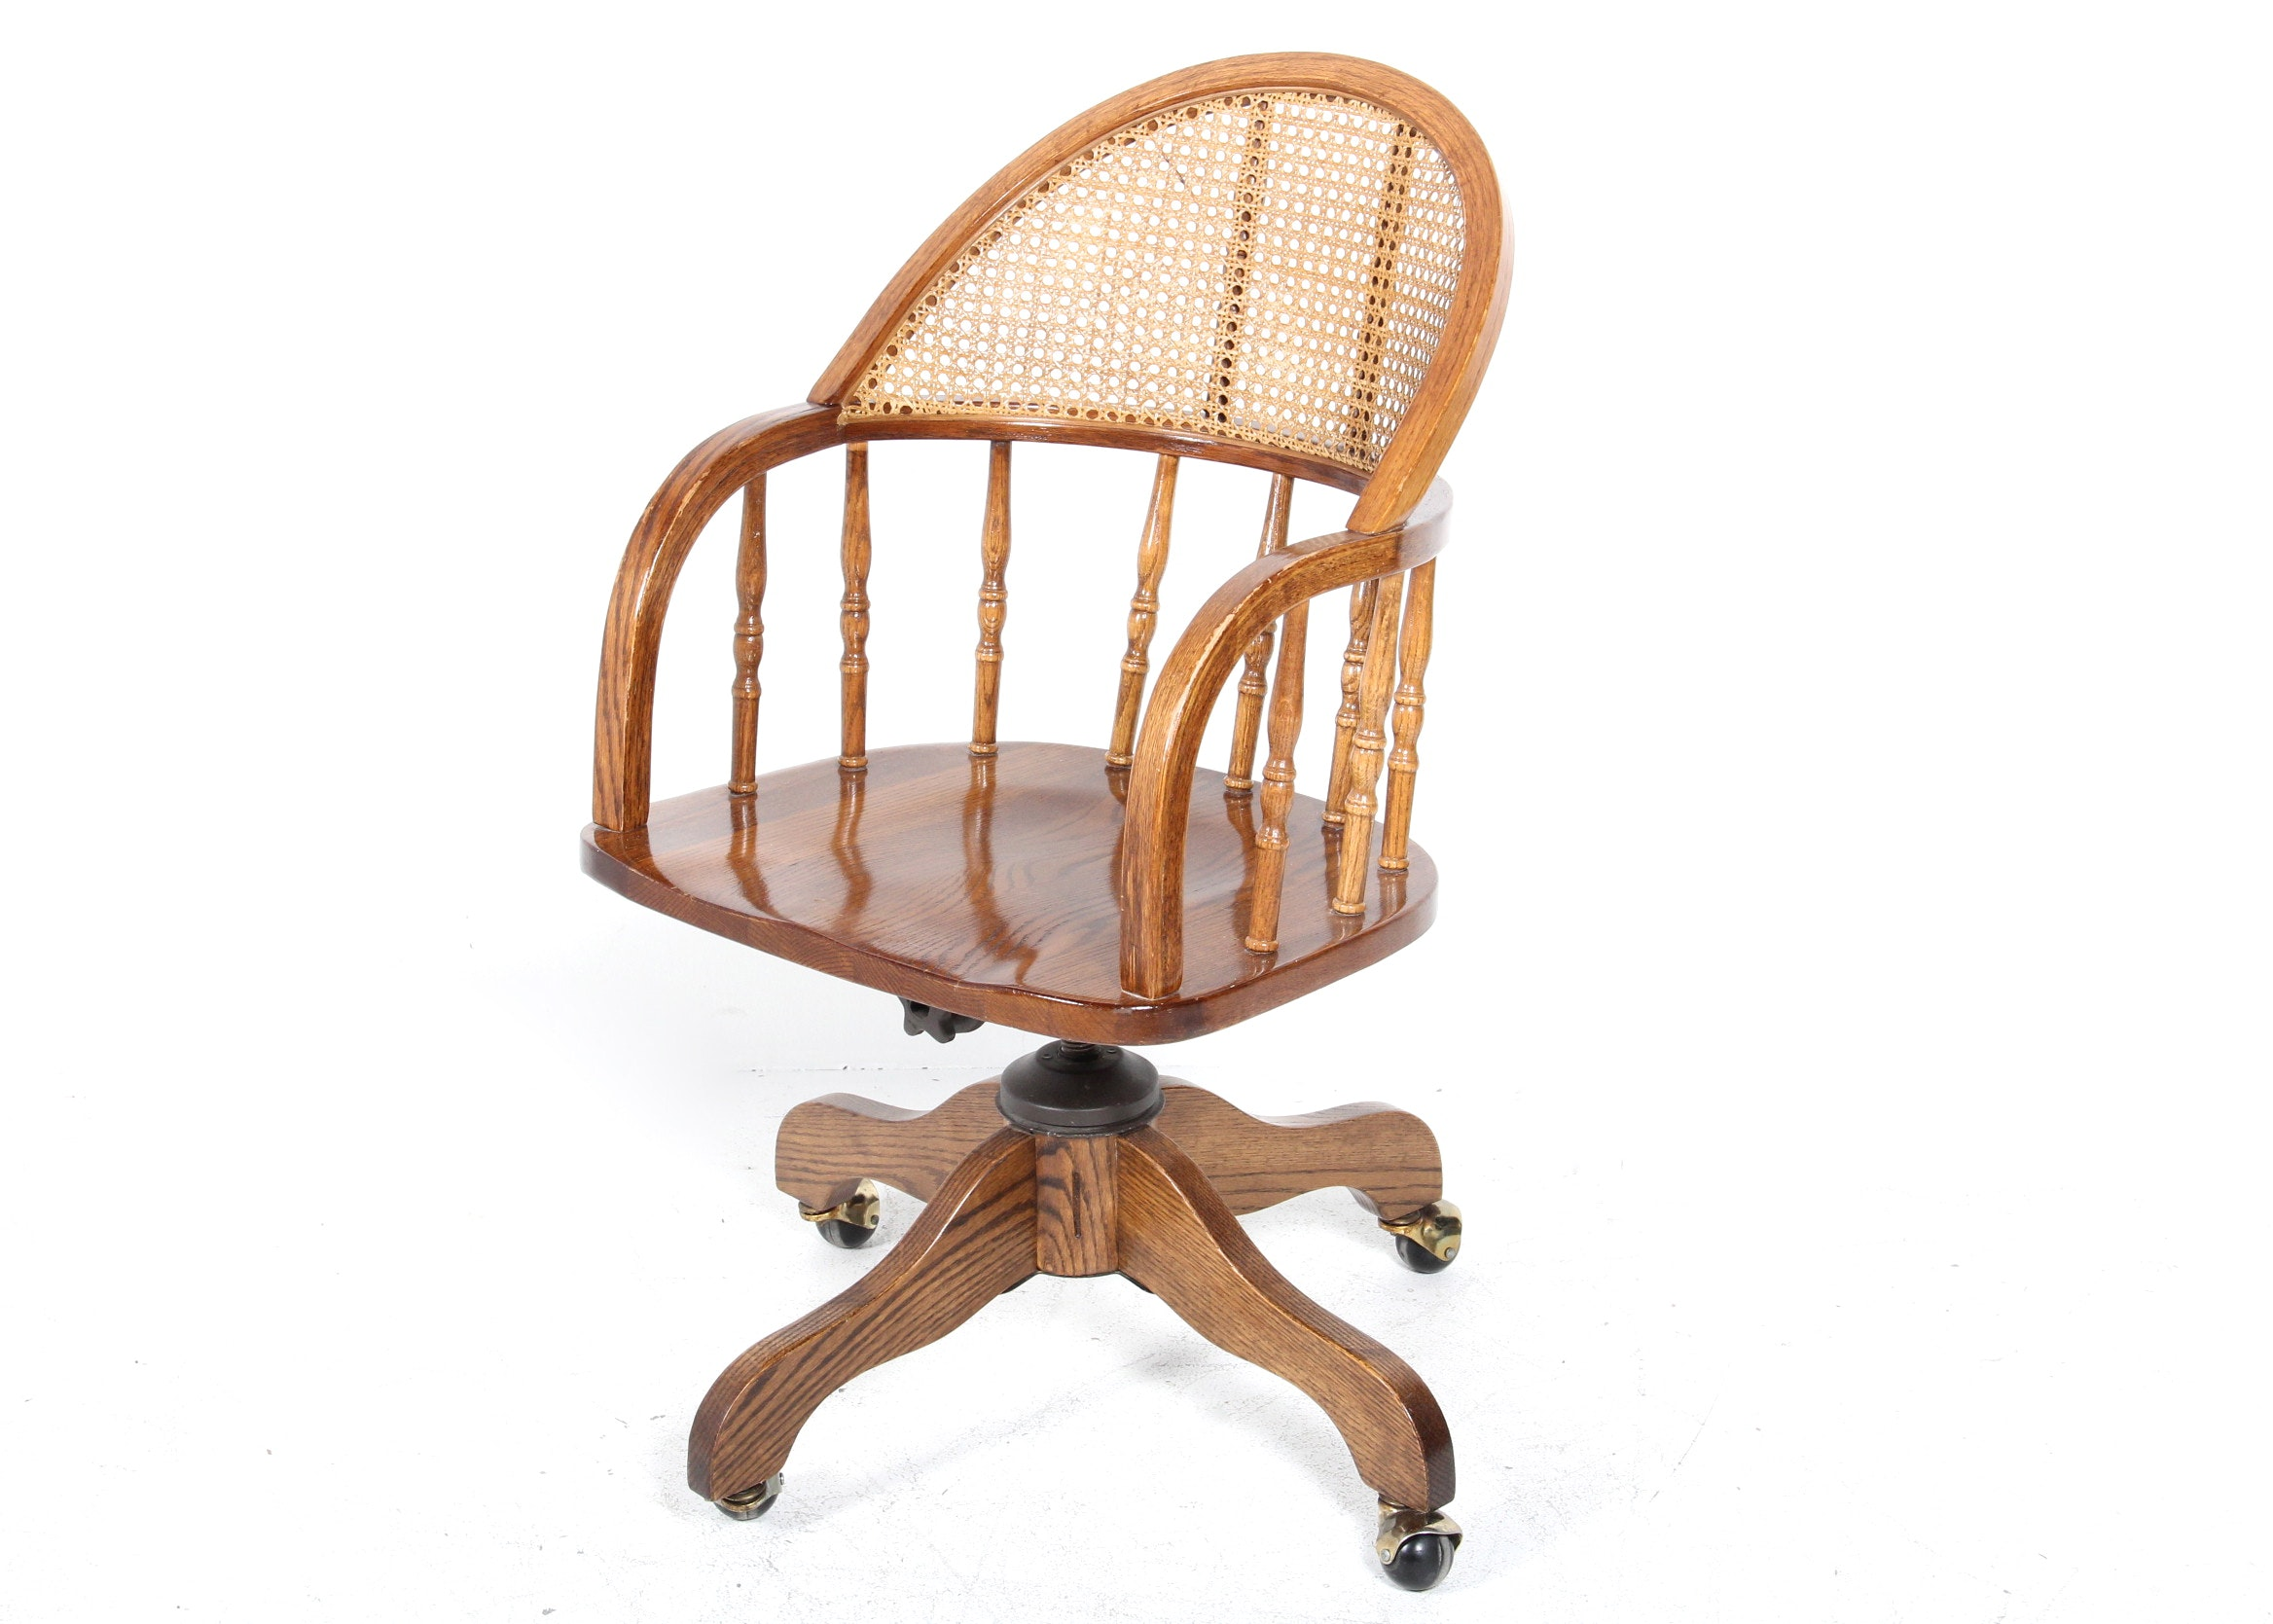 cane back office chair : ebth